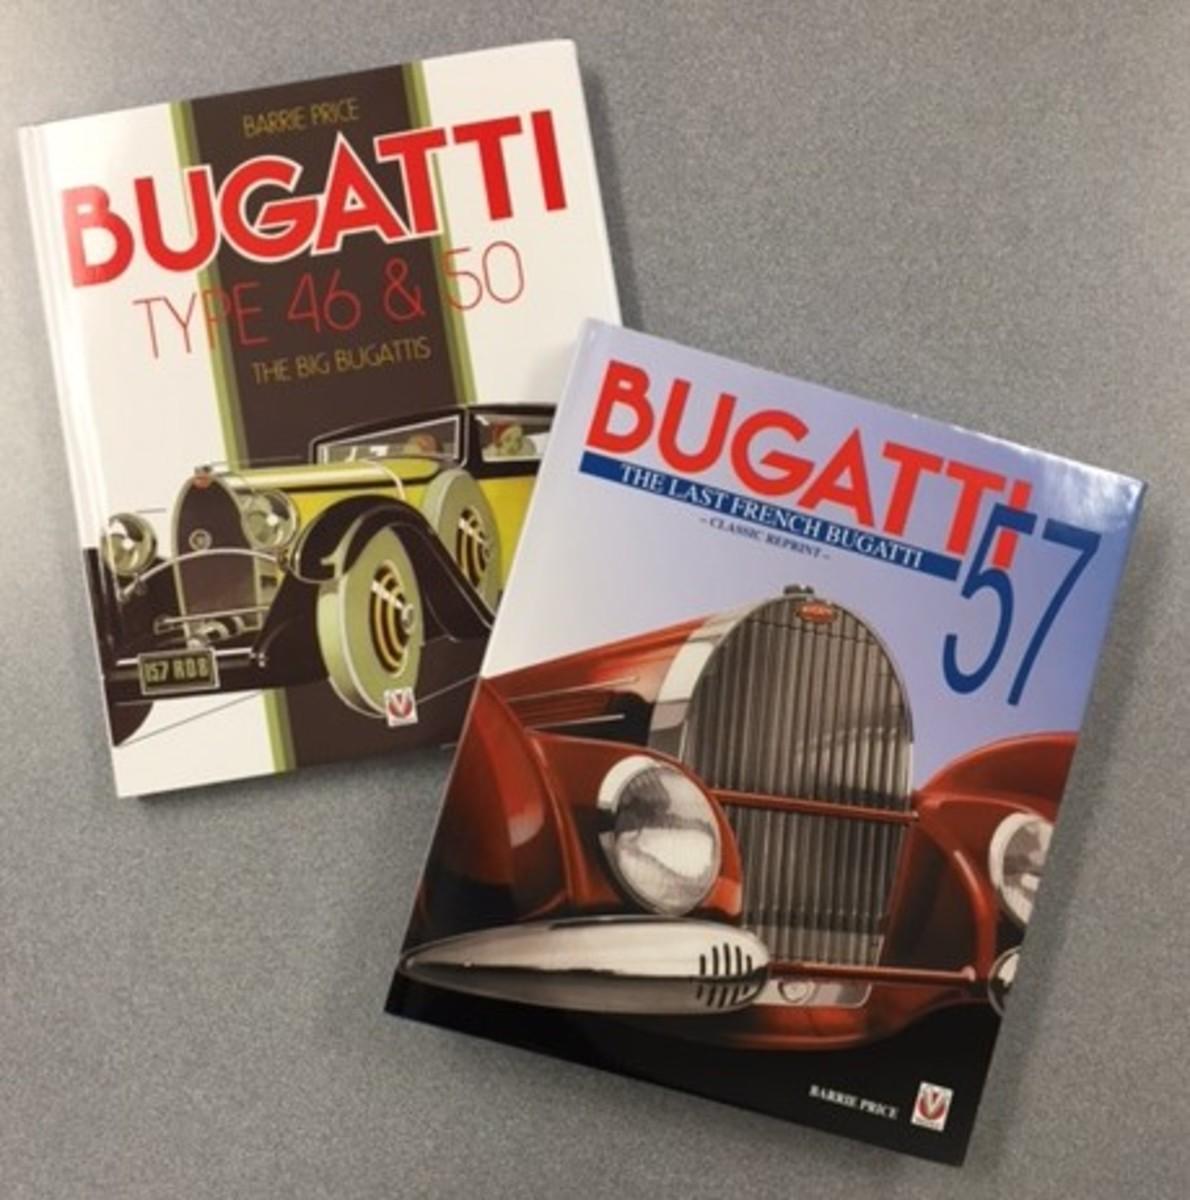 GFT15 Bugatti Type 46 50 57